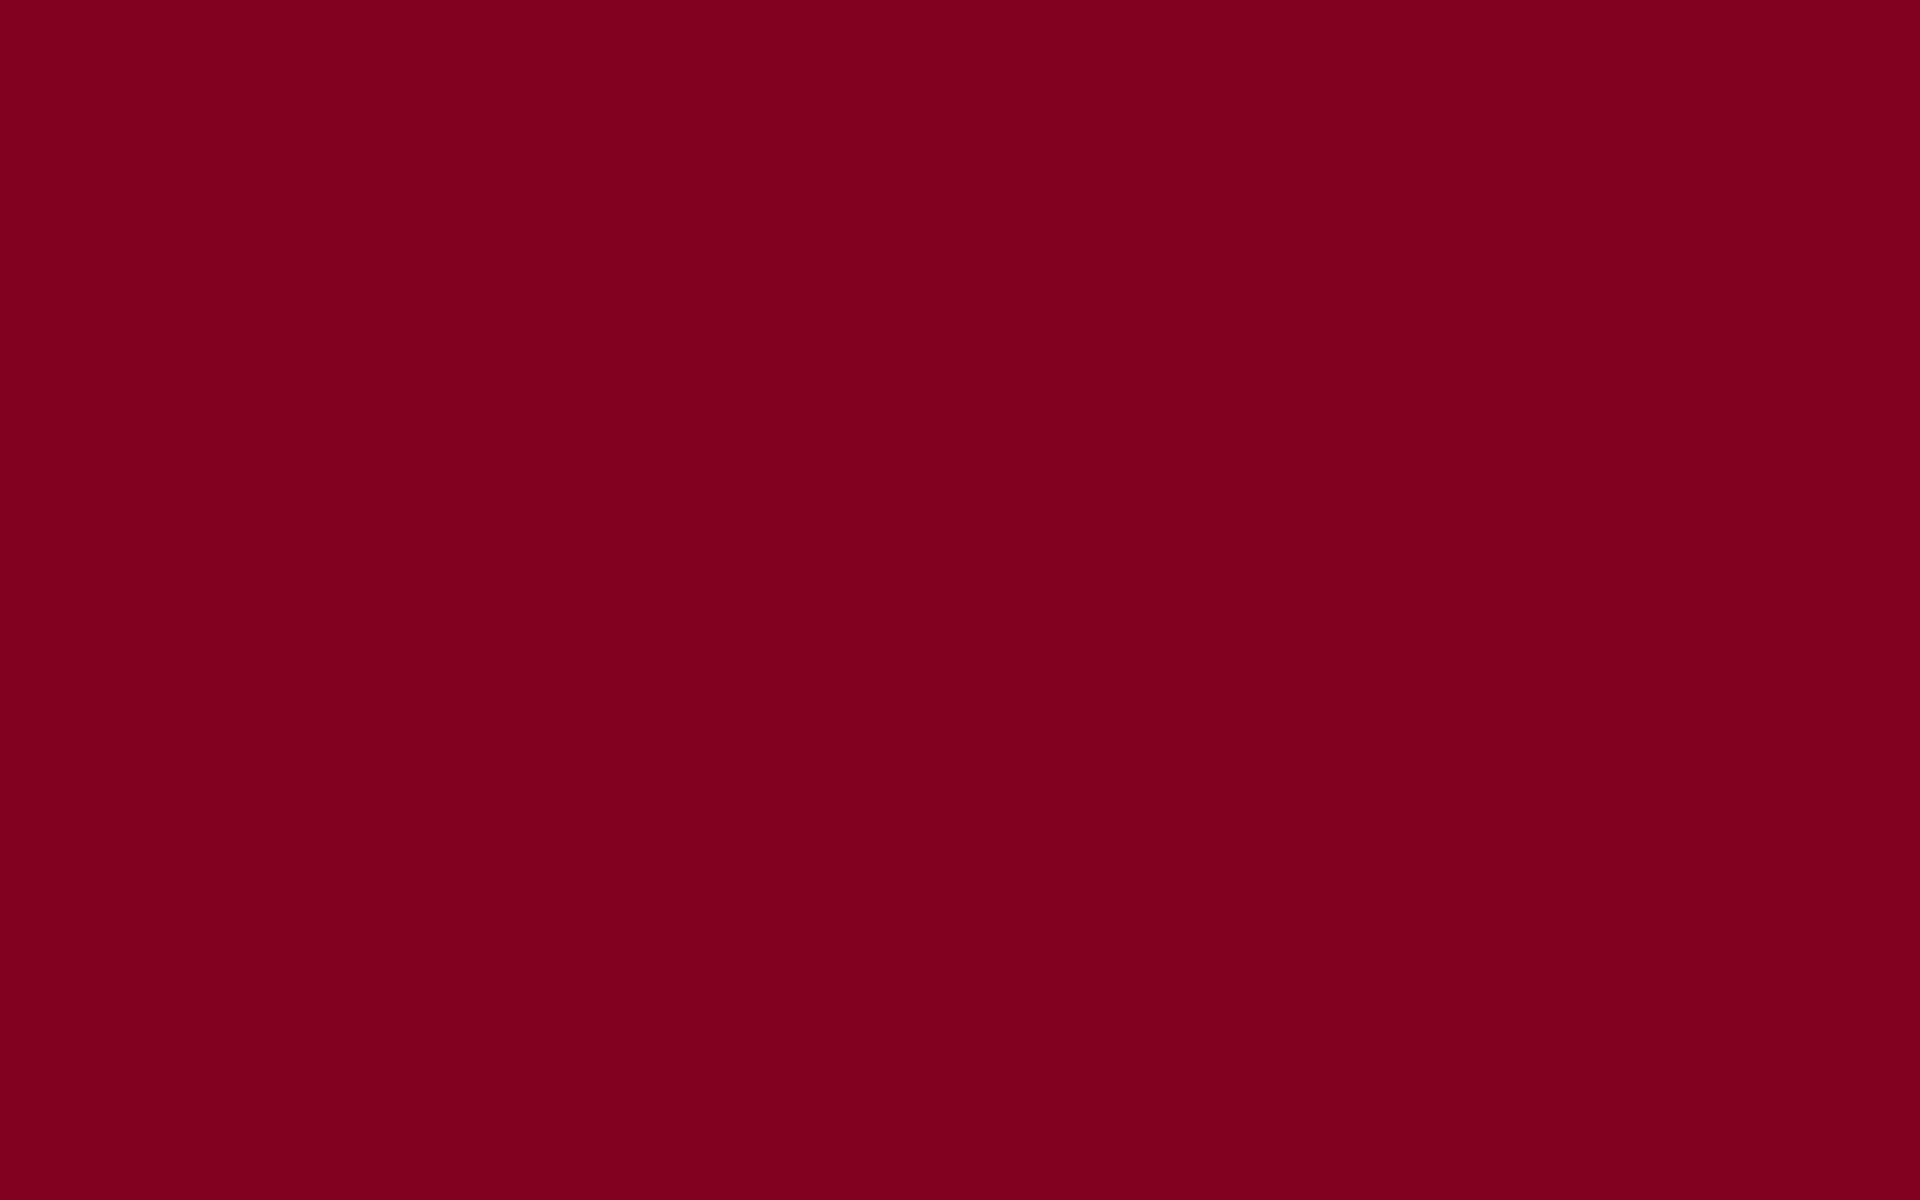 Solid Black Wallpaper 1920x1200 Burgundy Solid Color Background